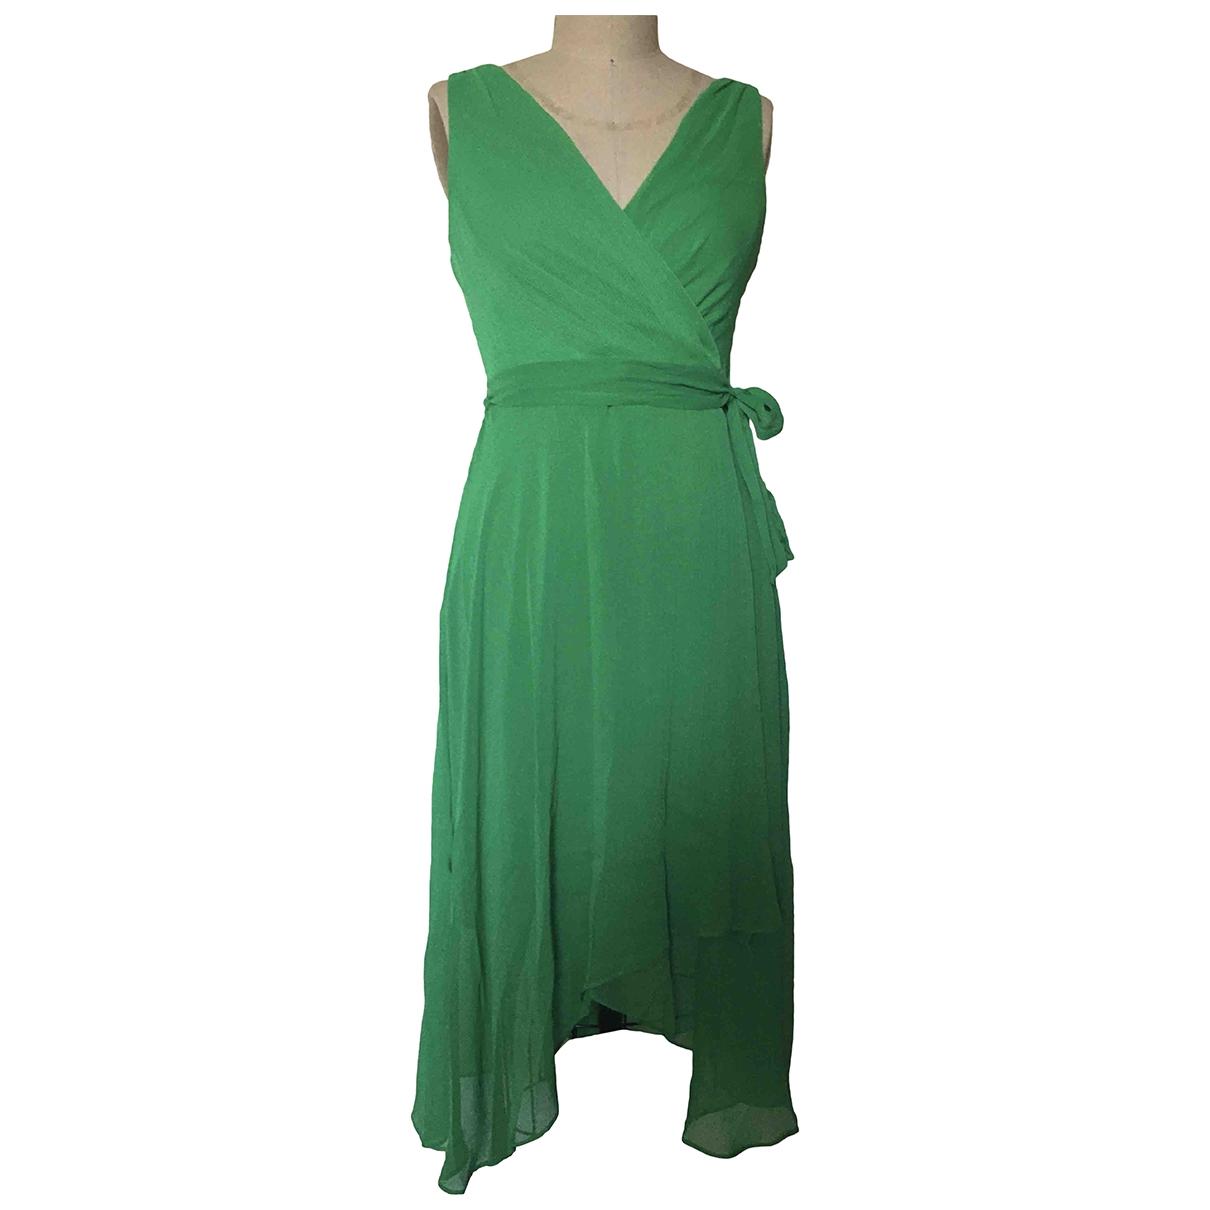 Dkny \N Kleid in  Gruen Polyester